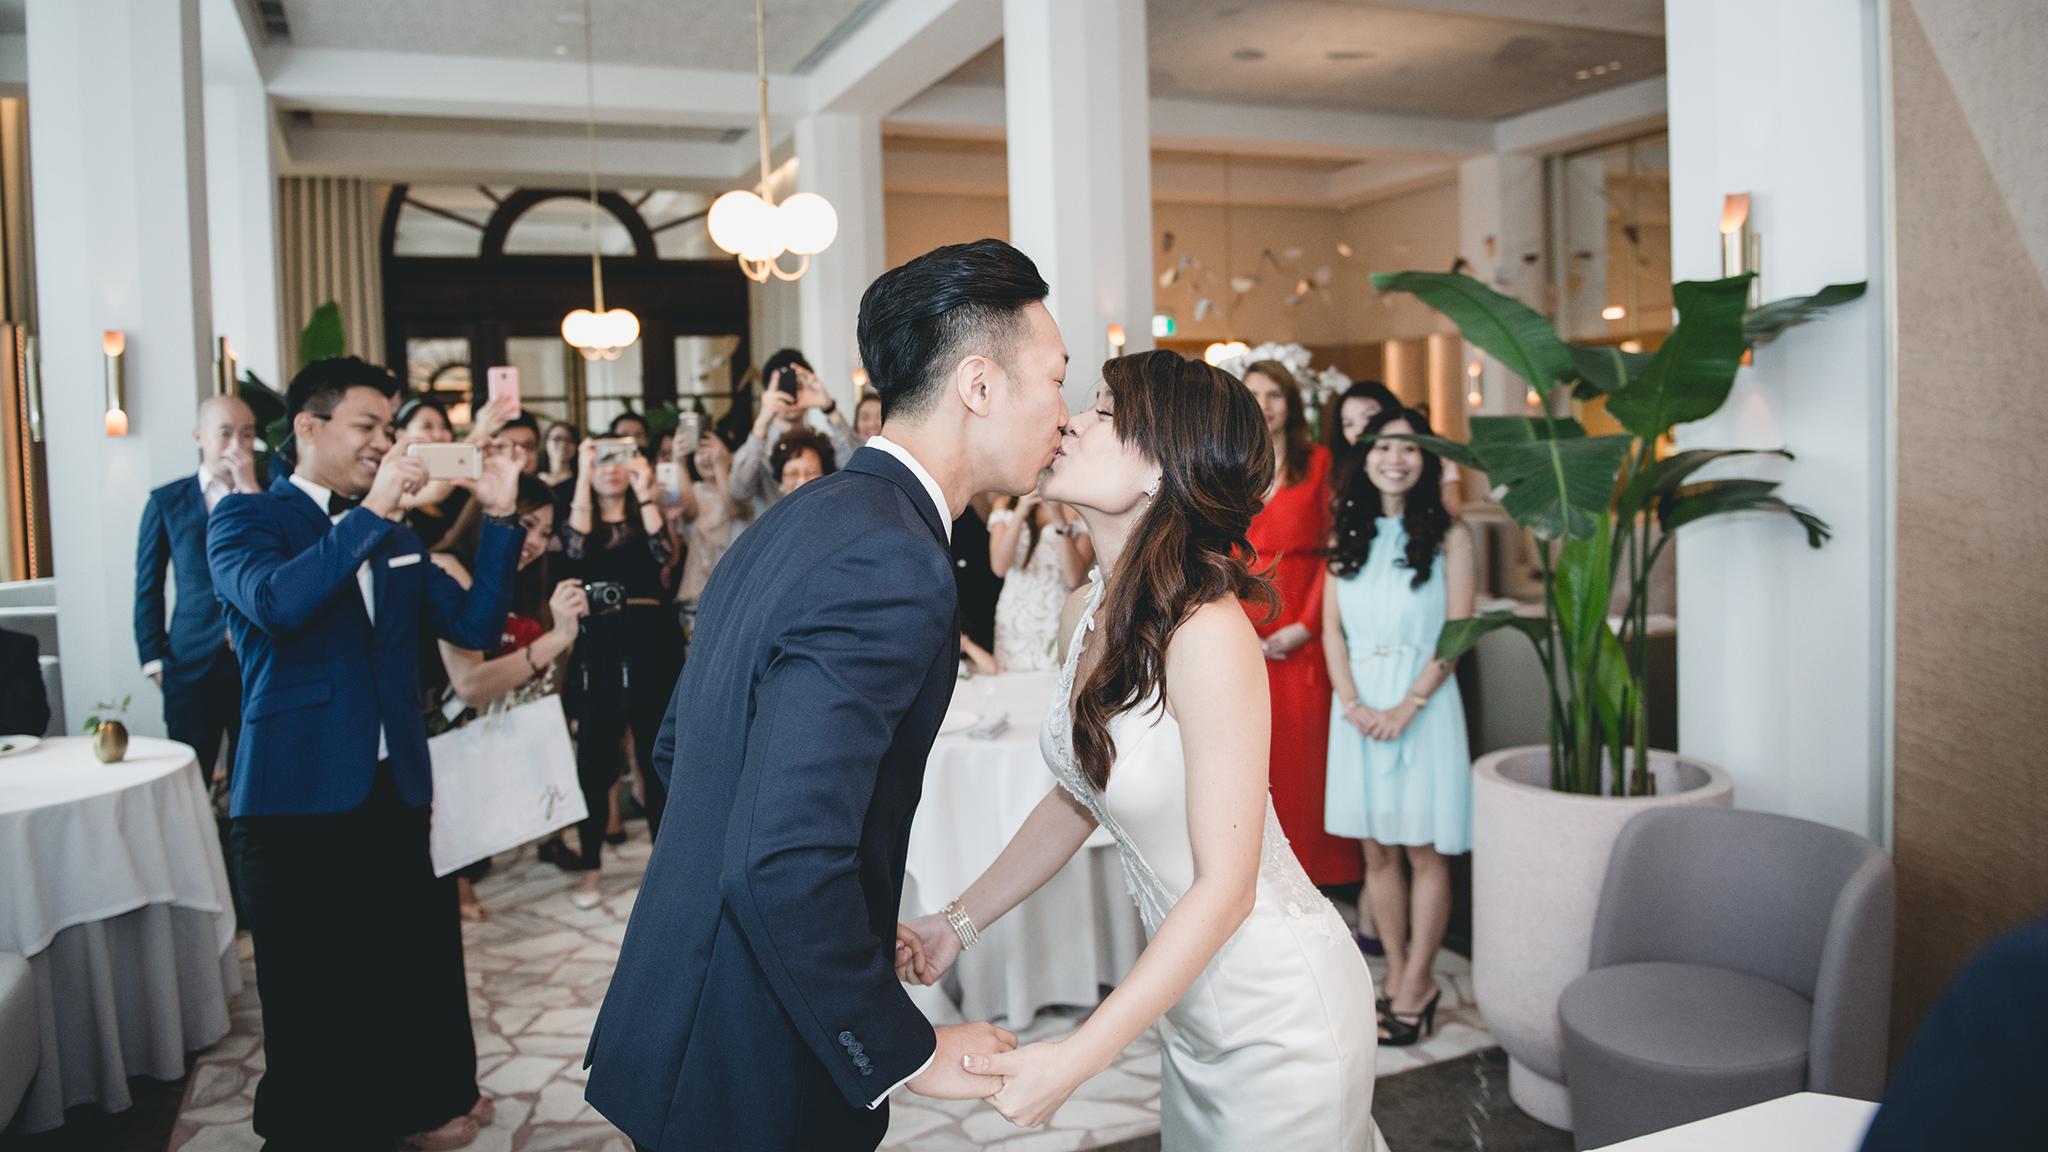 Wedding National Gallery 40.JPG